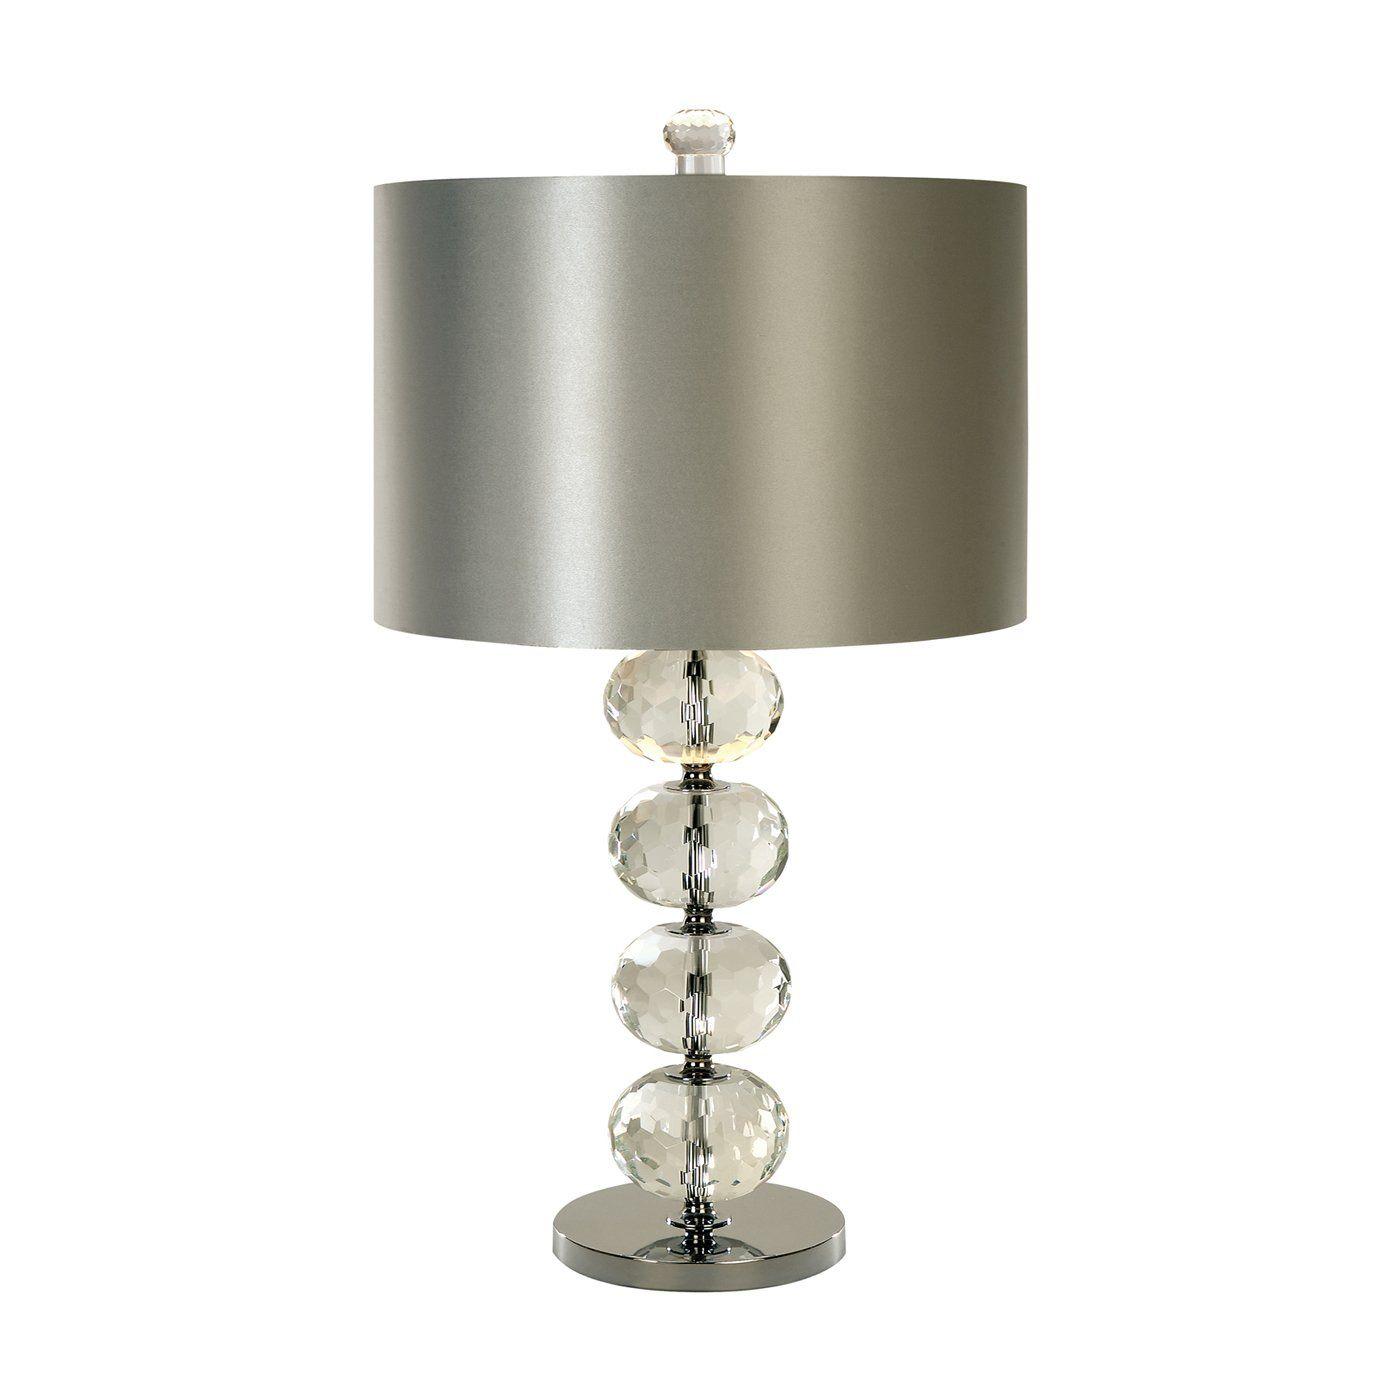 Trend Lighting Tt5884 Vision Crystal Table Lamp Lighting